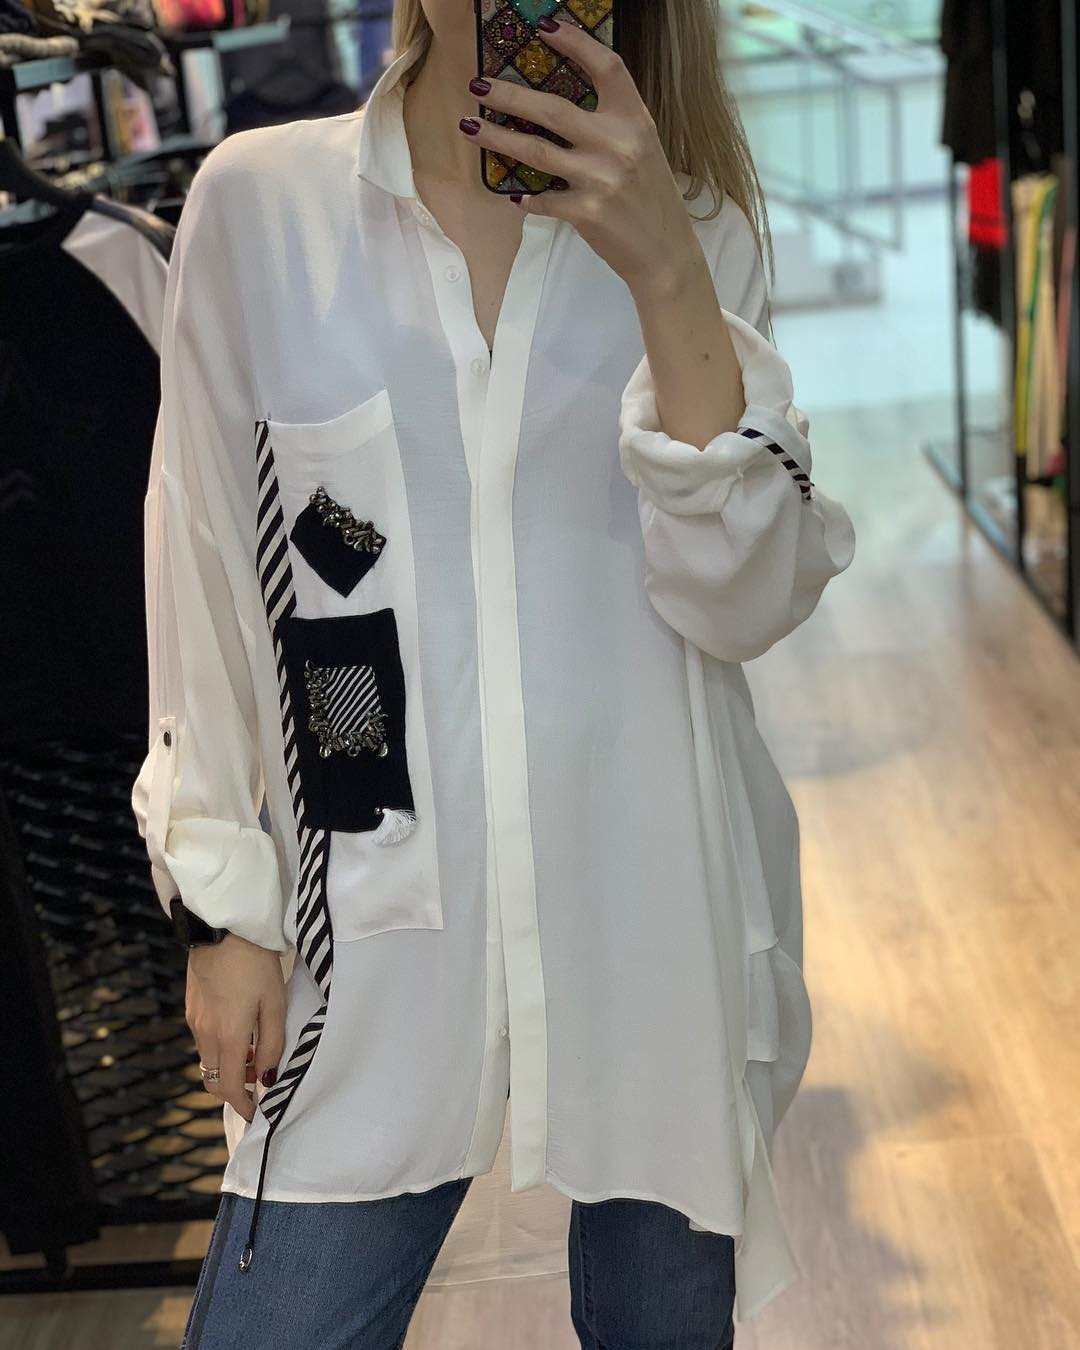 Женские-рубашки-2020;-модные-рубашки-2020-(тренды-на-фото)